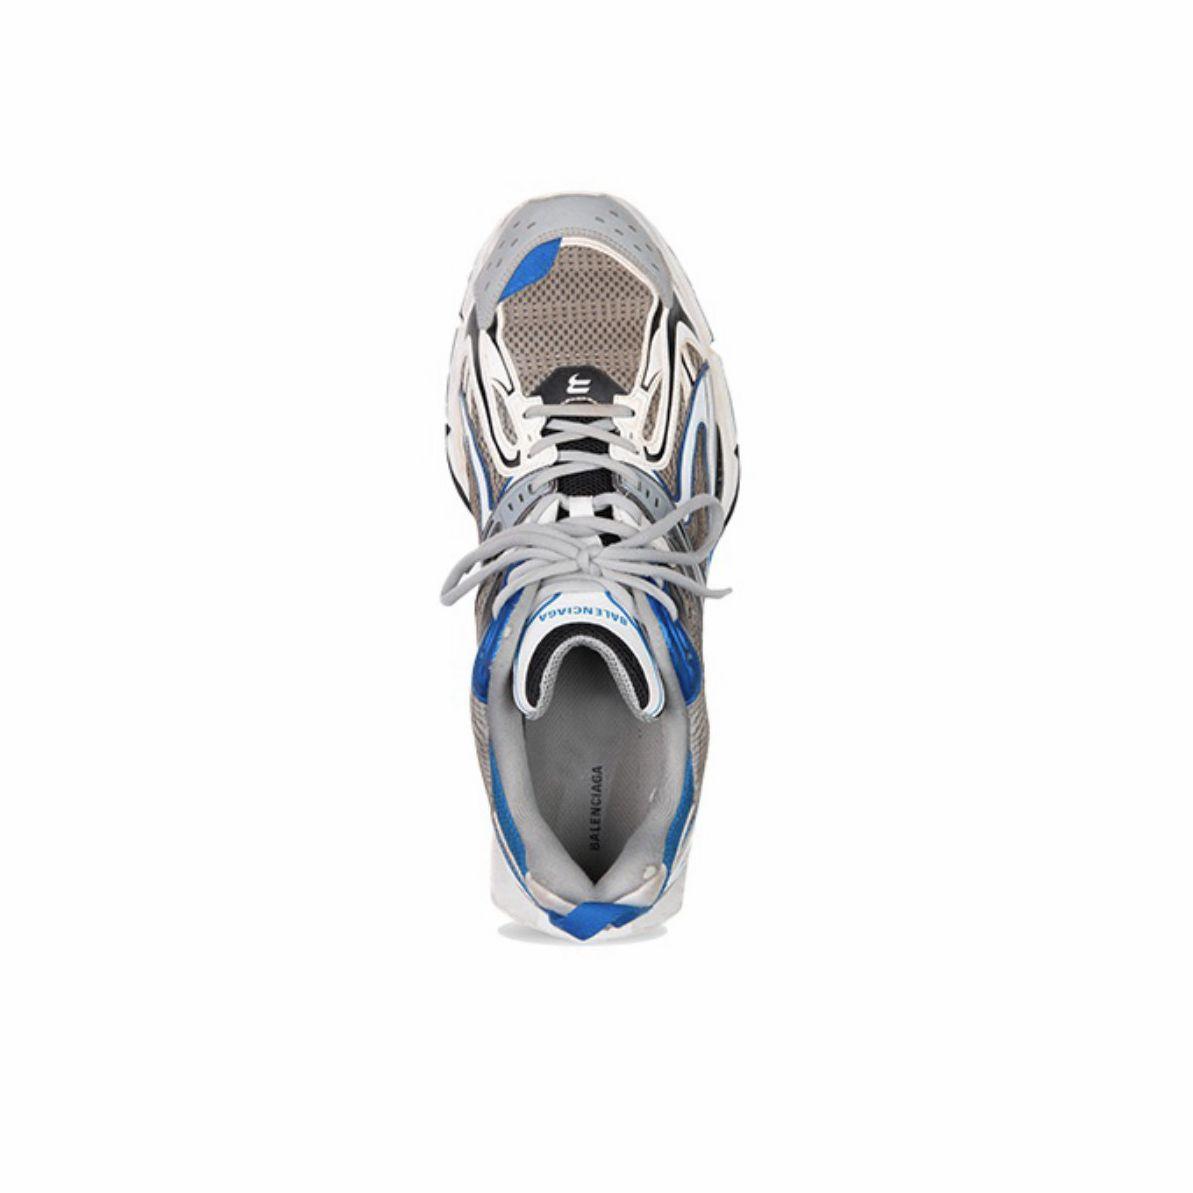 Balenciaga,X-Pander  侃爷没穿 Yeezy,穿了一双「弹簧鞋」!造型过分夸张!